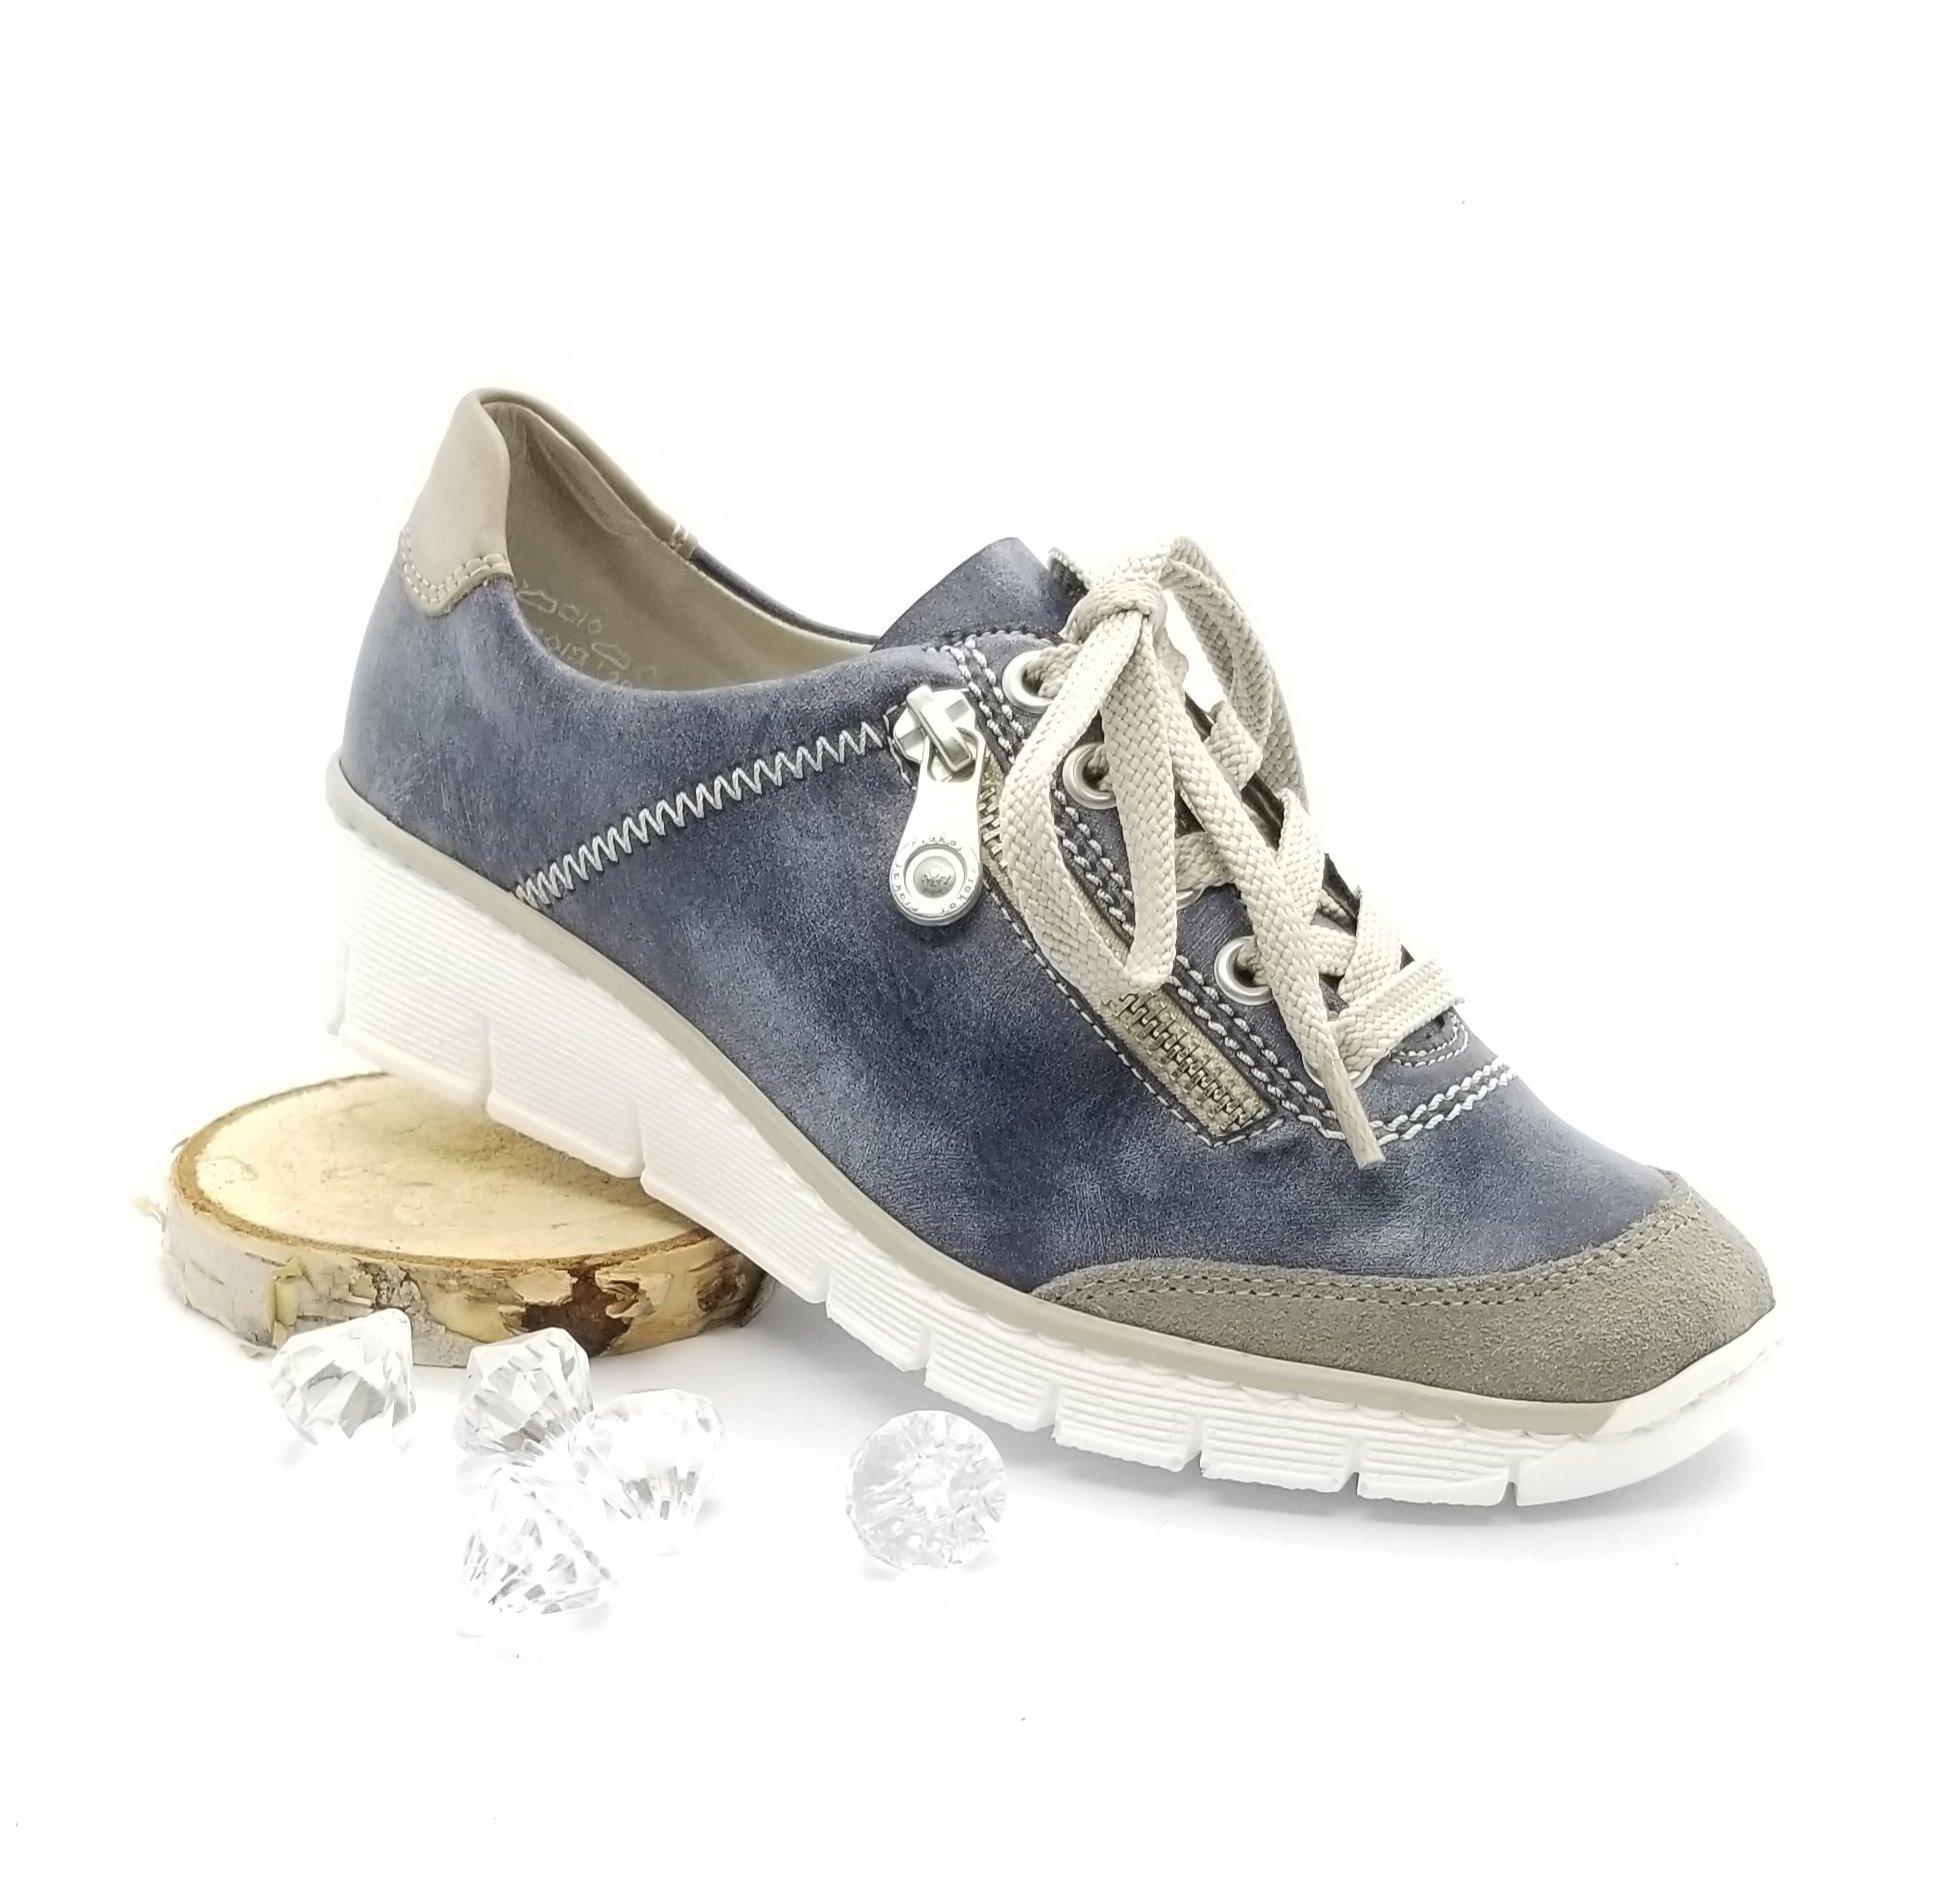 Rioux Hommeamp; Femme Hommeamp; Rioux Chaussures Chaussures iOkZTuPX